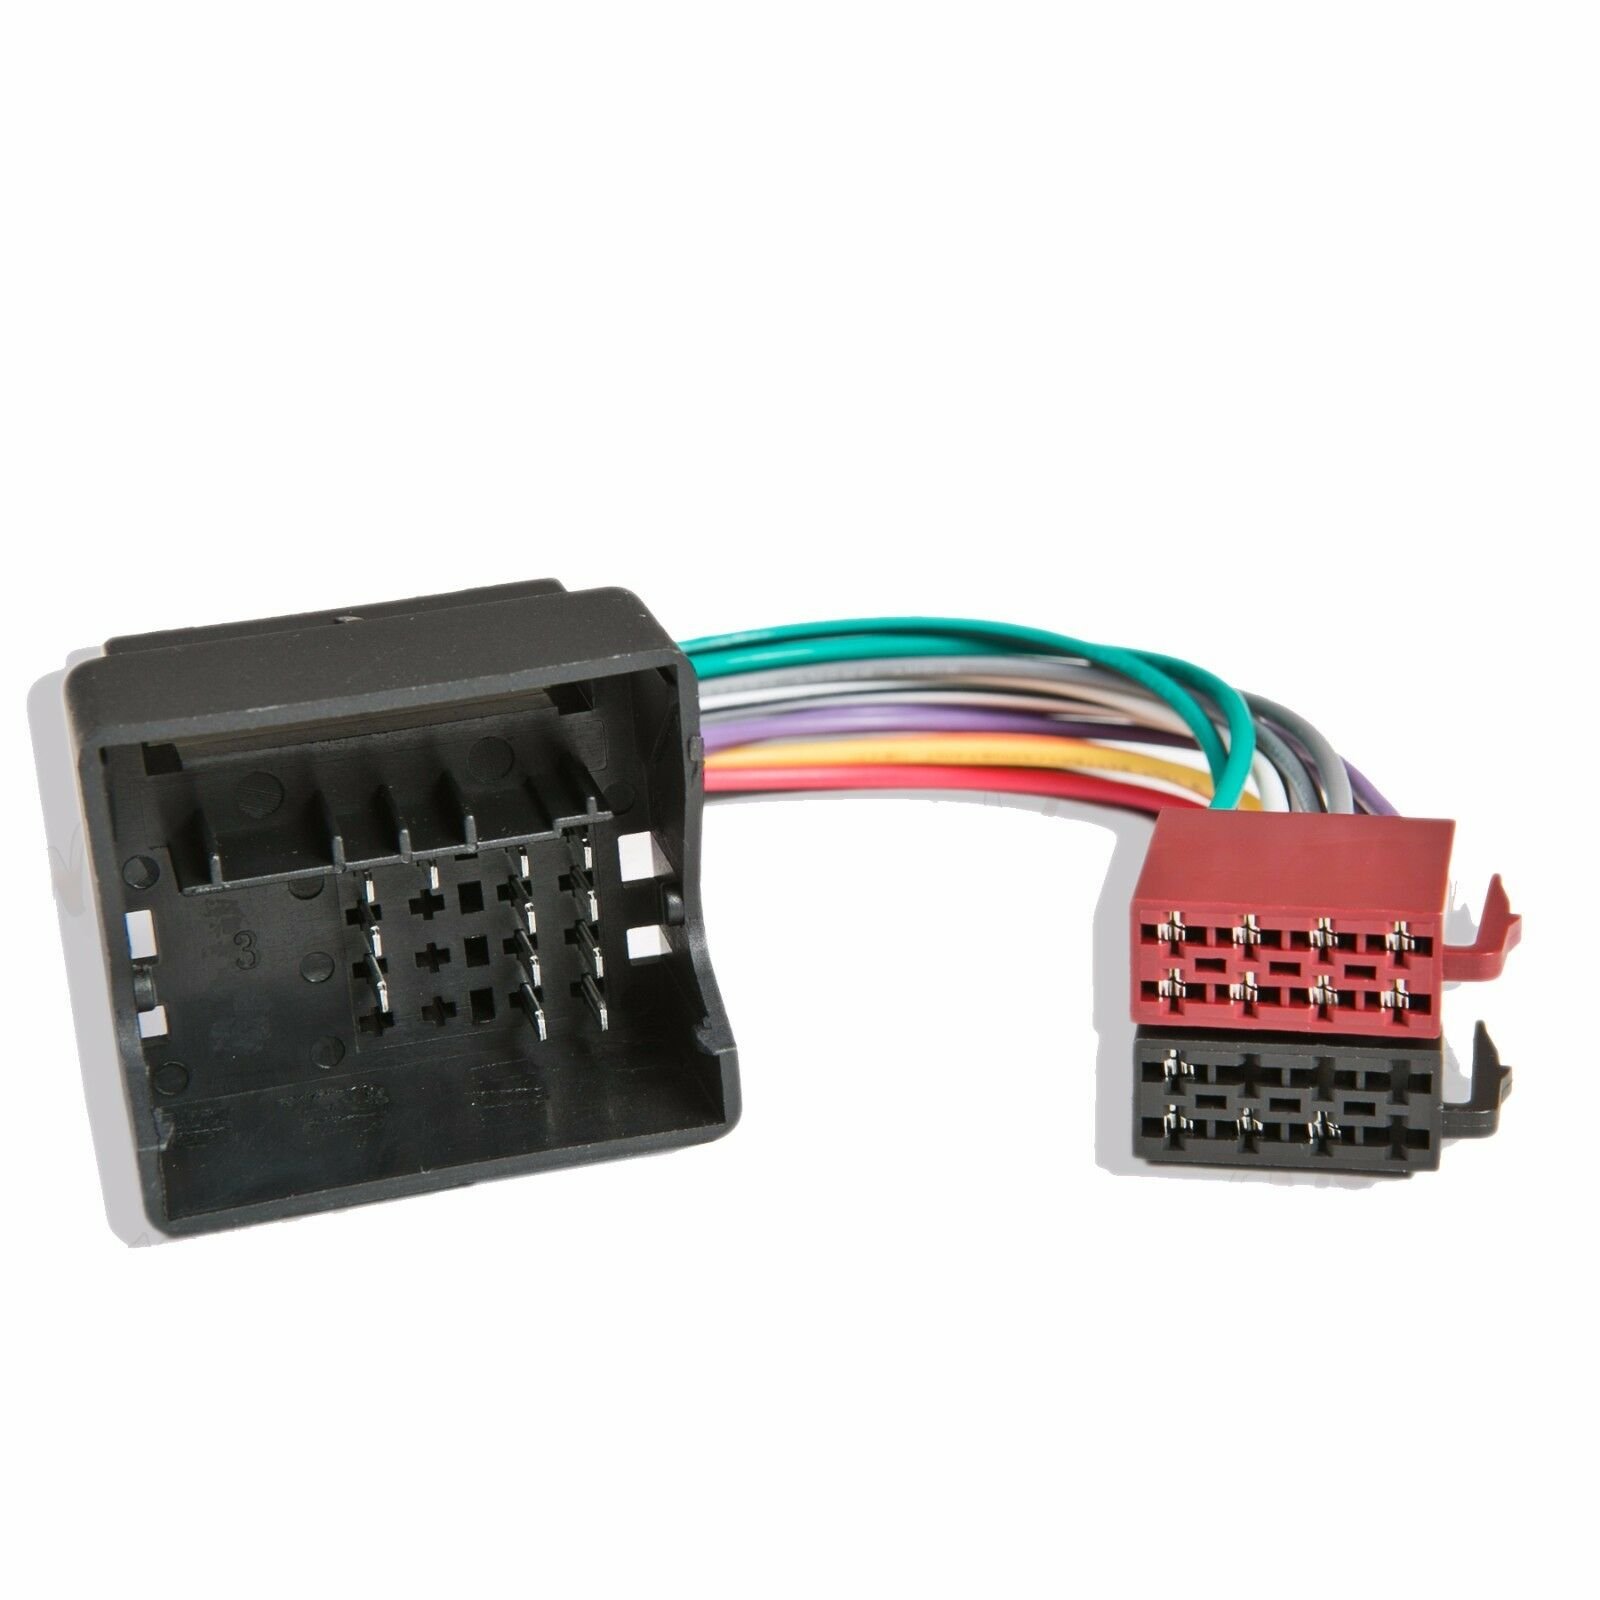 Ford Transit Quadlock Radio Wiring Iso Harness Headunit Connector Plug Connectors Loom